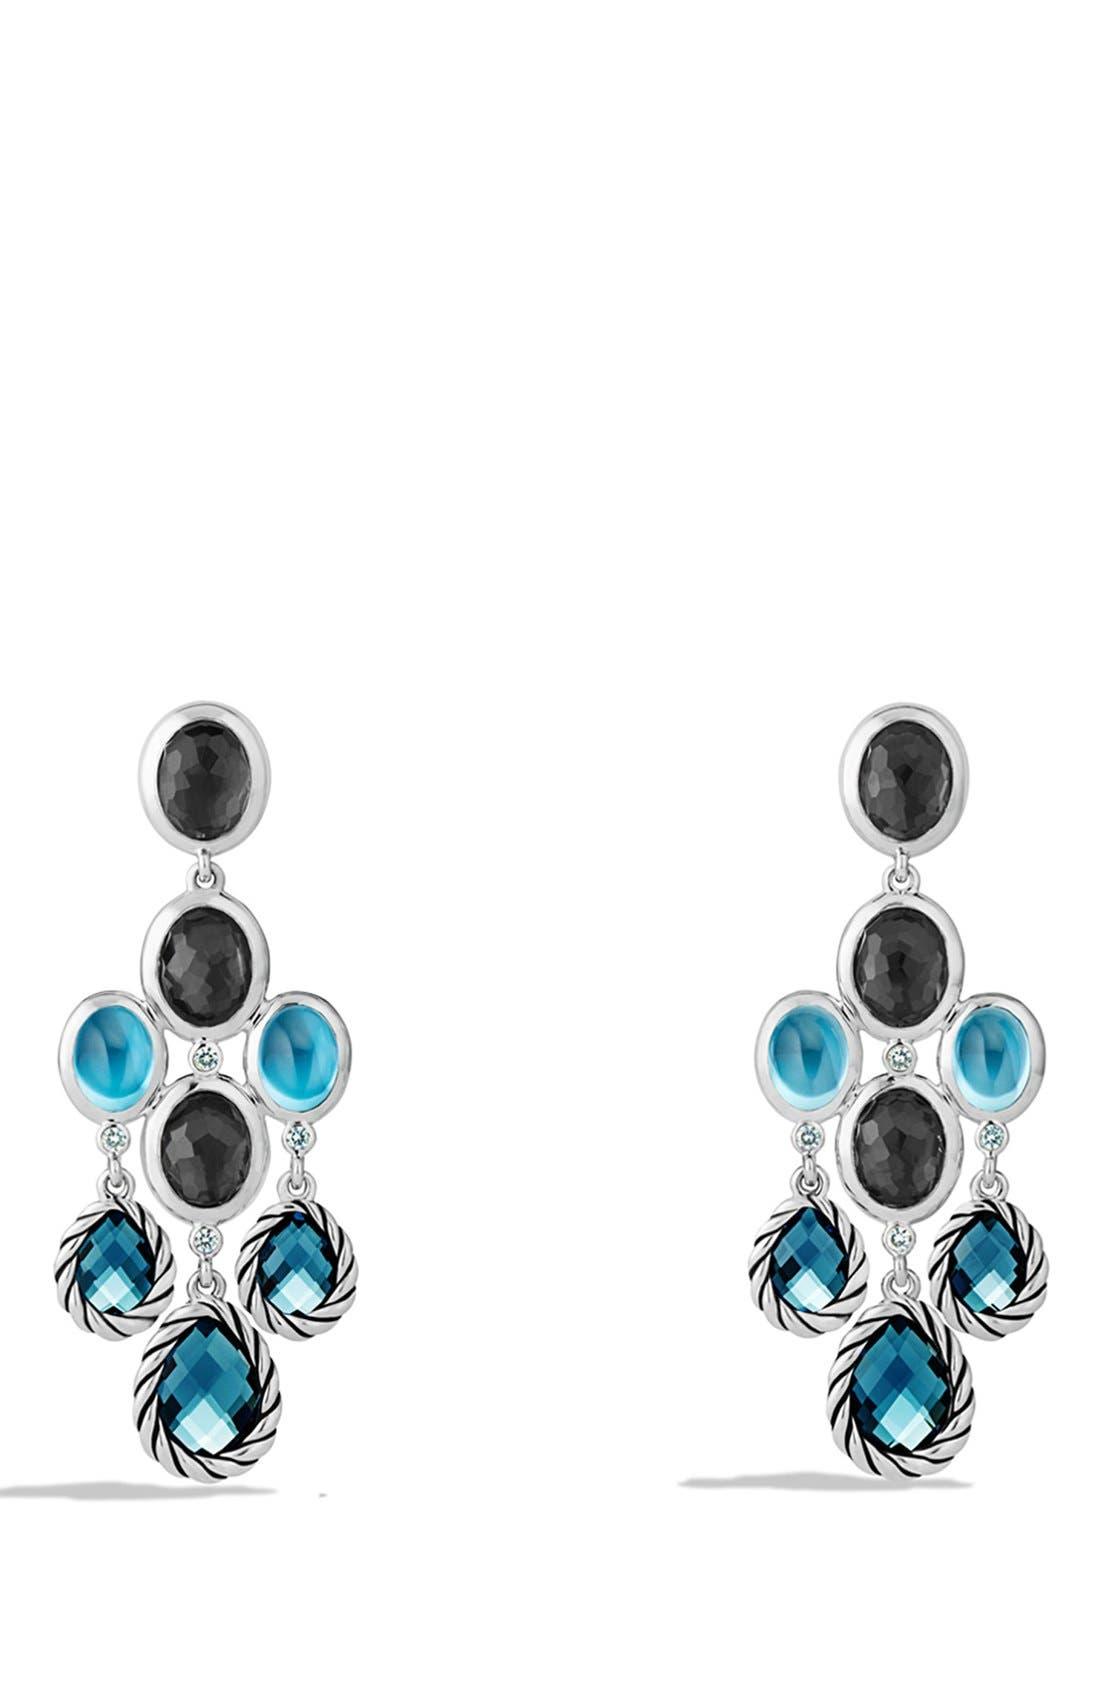 Main Image - David Yurman 'Mosaic - Color Classic' Chandelier Earrings with Hampton Blue Topaz, Black Orchid & Gray Sapphires